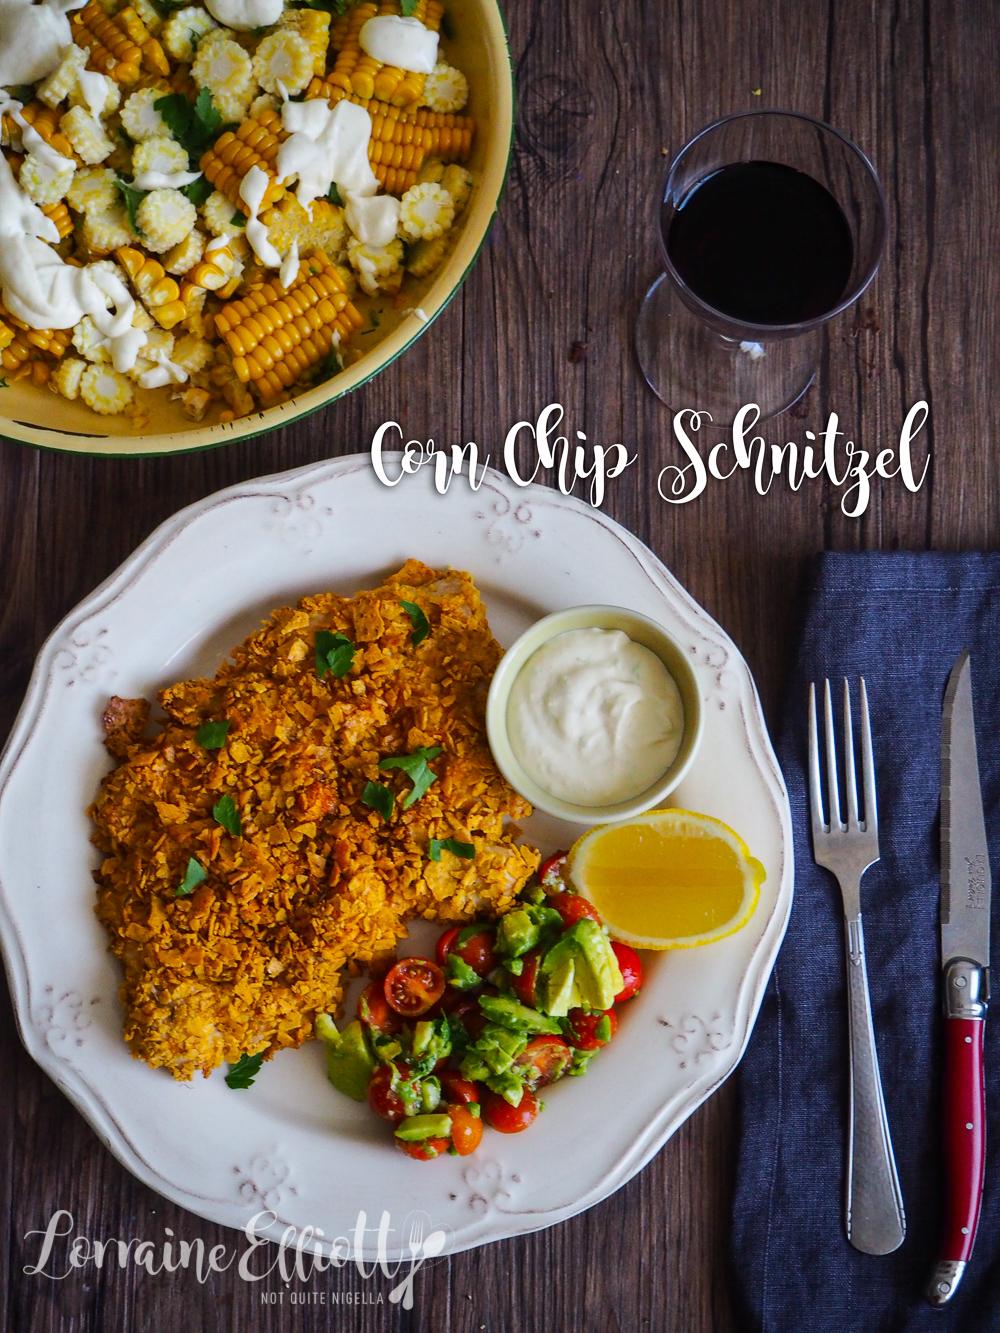 Corn Chip Schnitzel